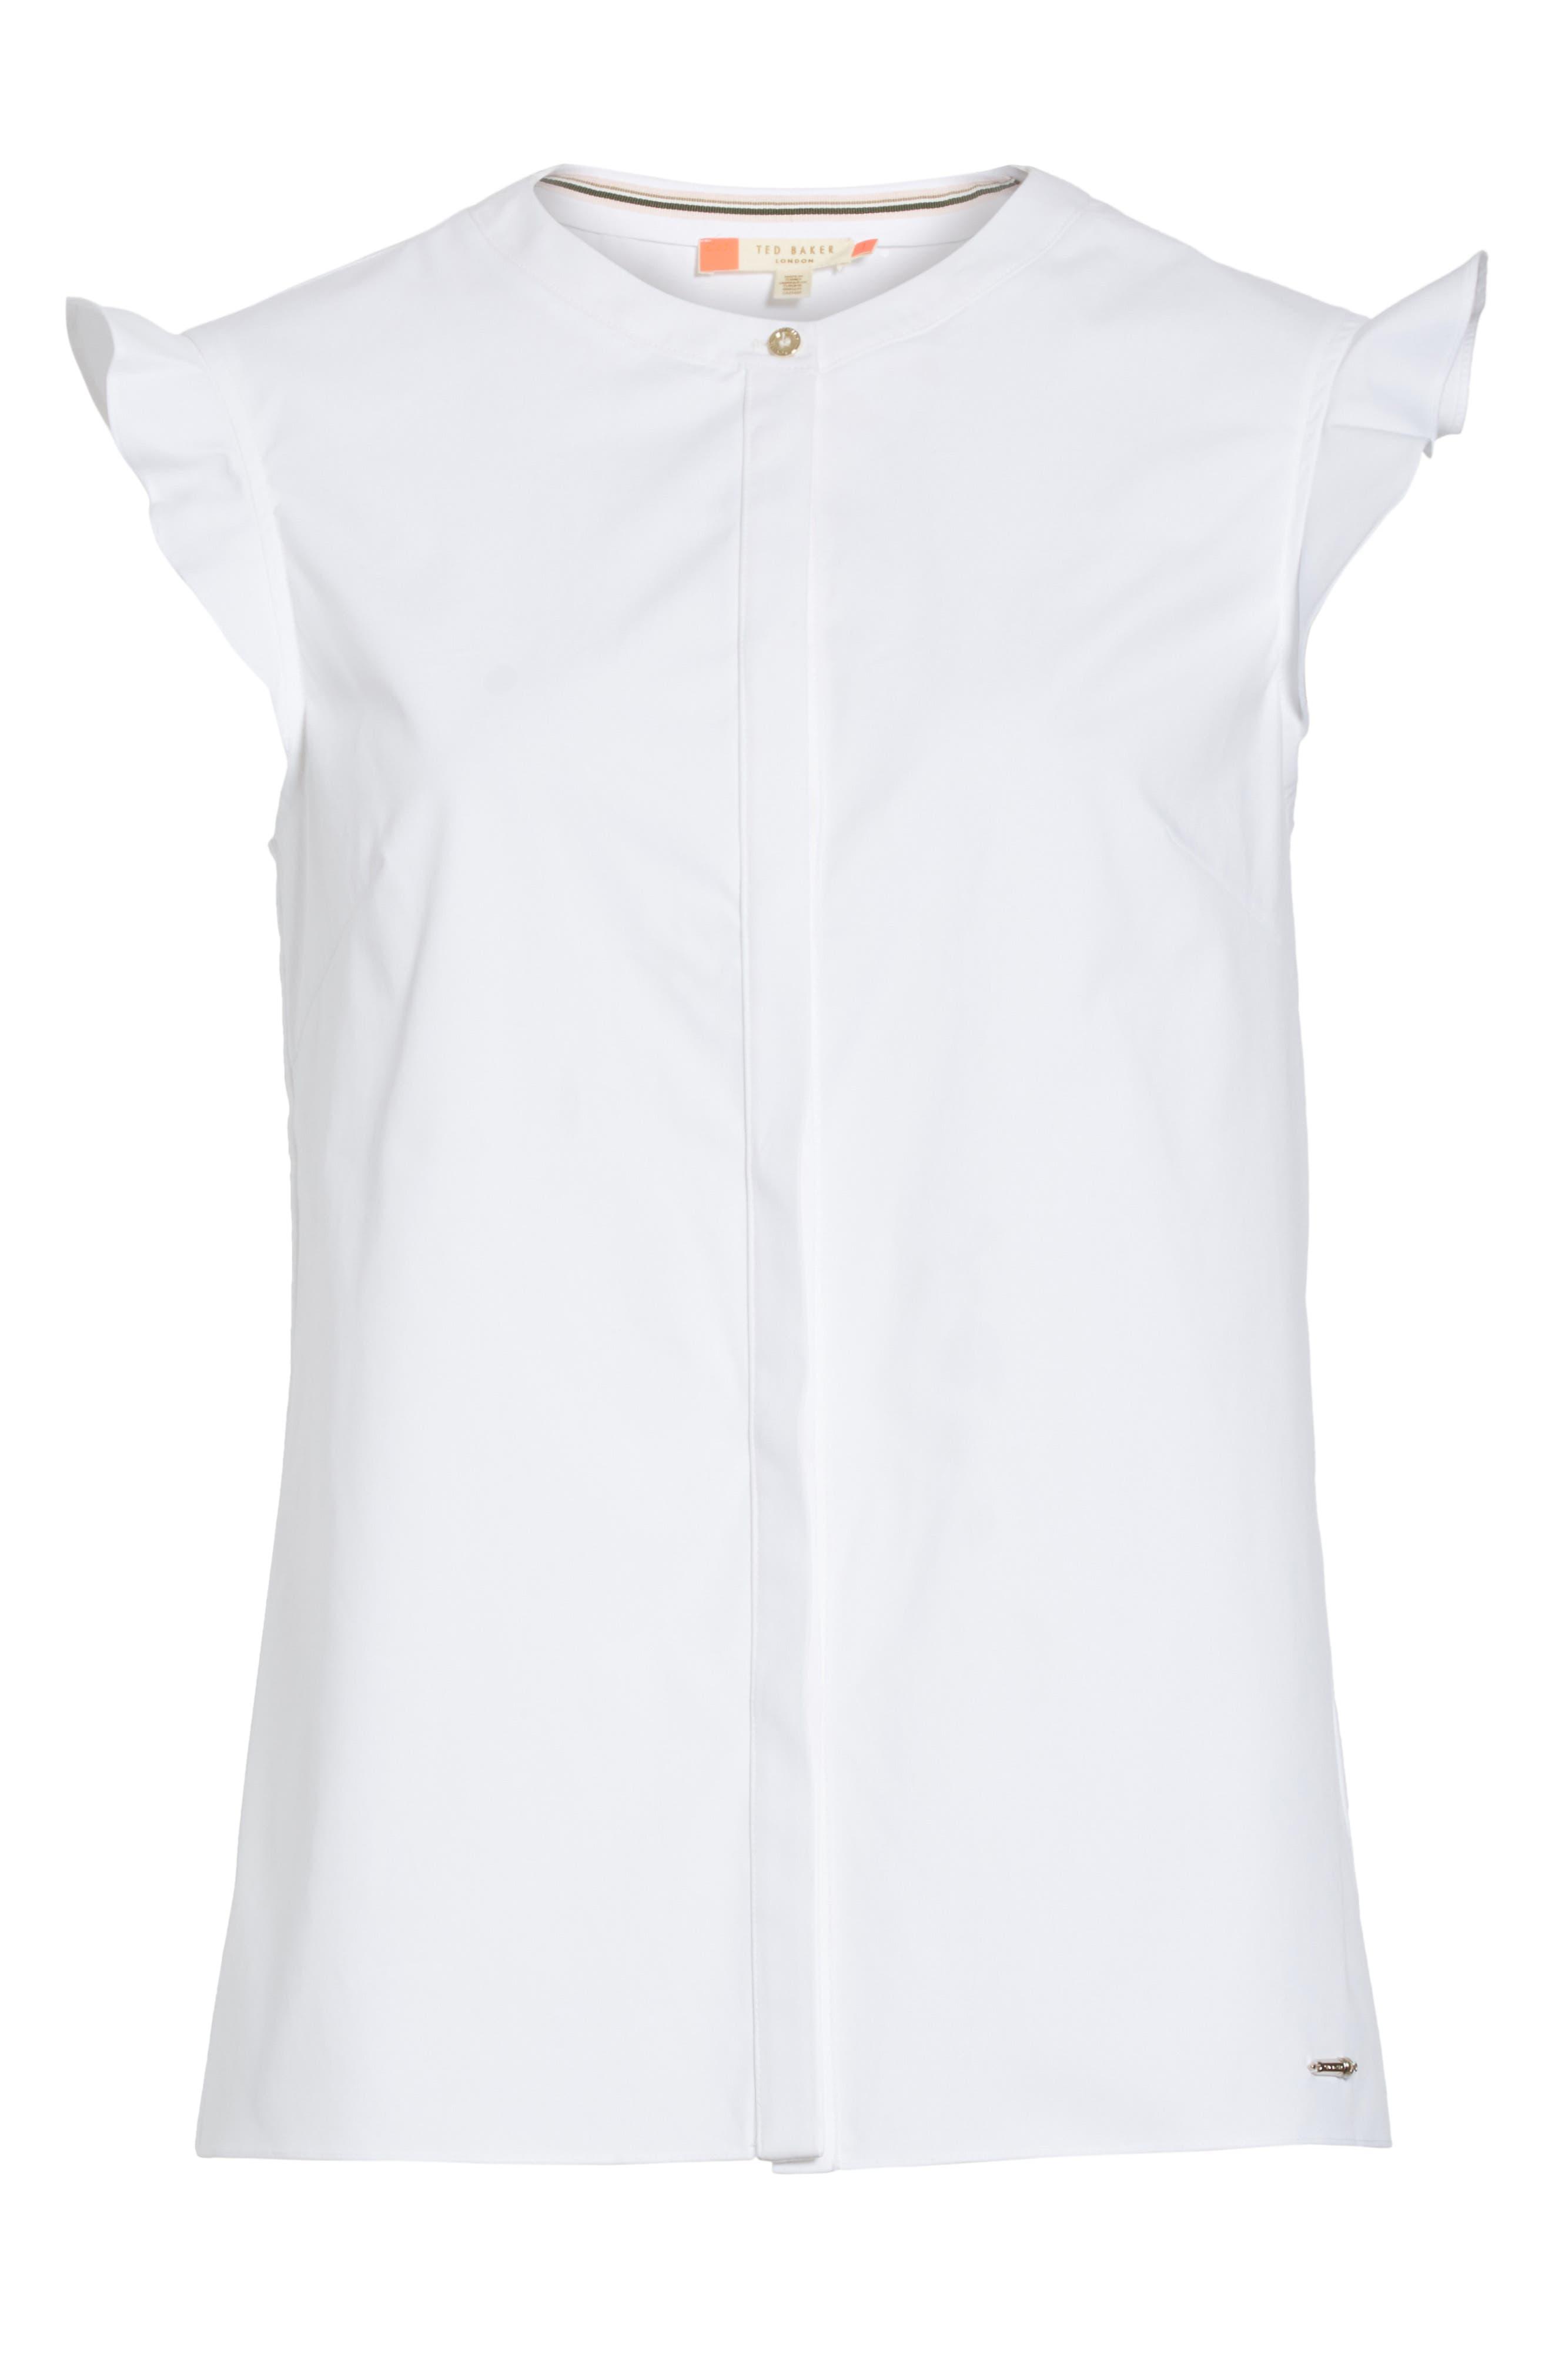 Veryien Ruffle Trim Shirt,                             Alternate thumbnail 6, color,                             110